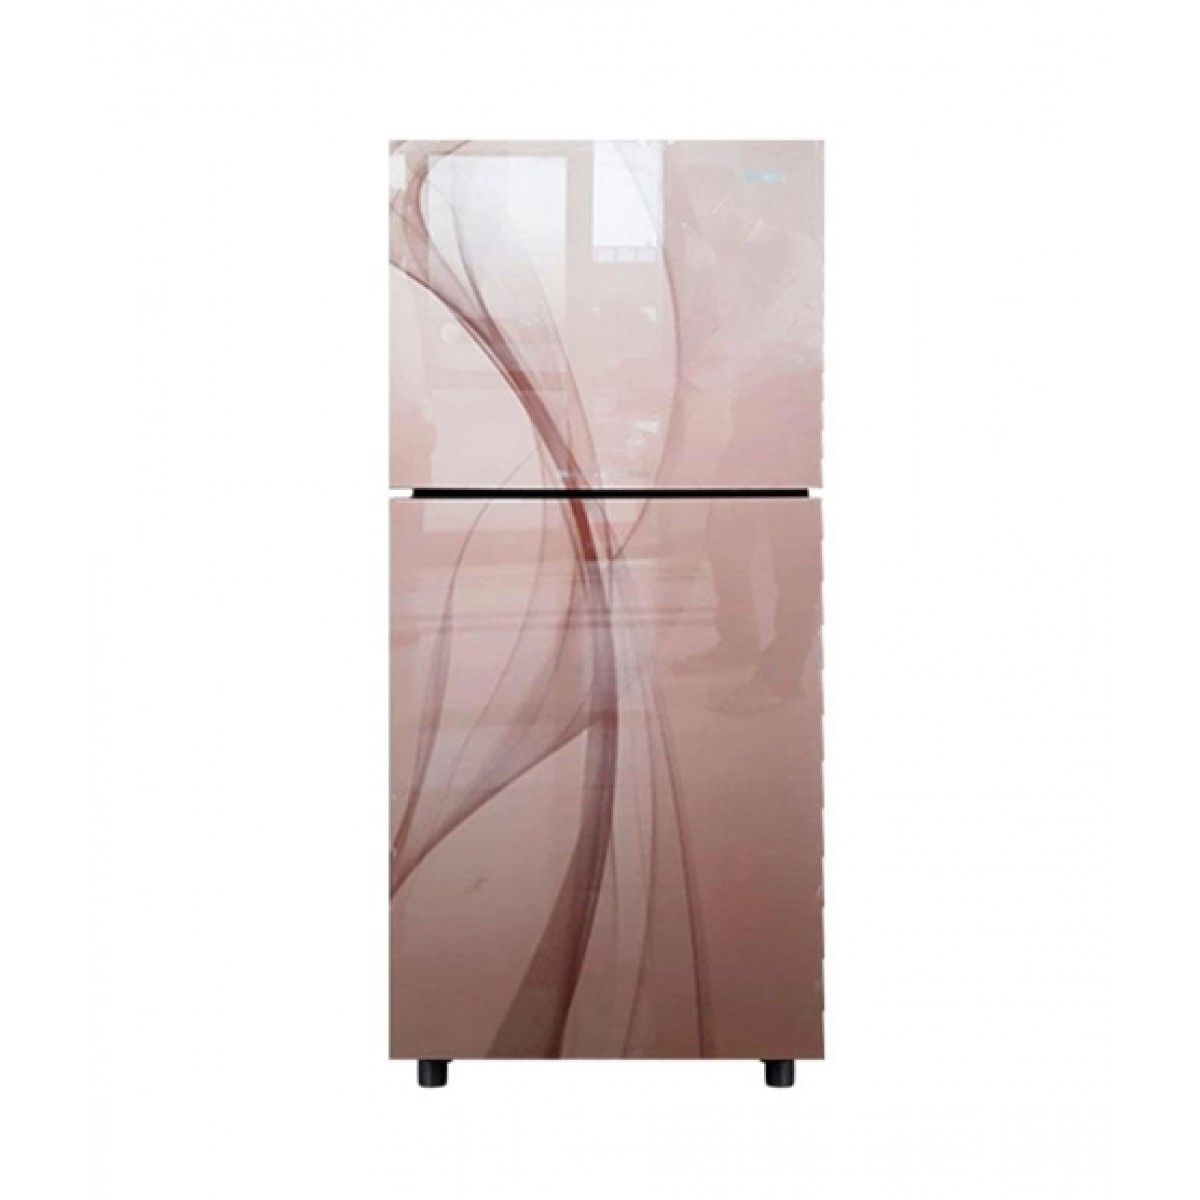 Orient Crystal 540 Freezer-on-Top 20 Cu Ft Refrigerator Glaze Golden